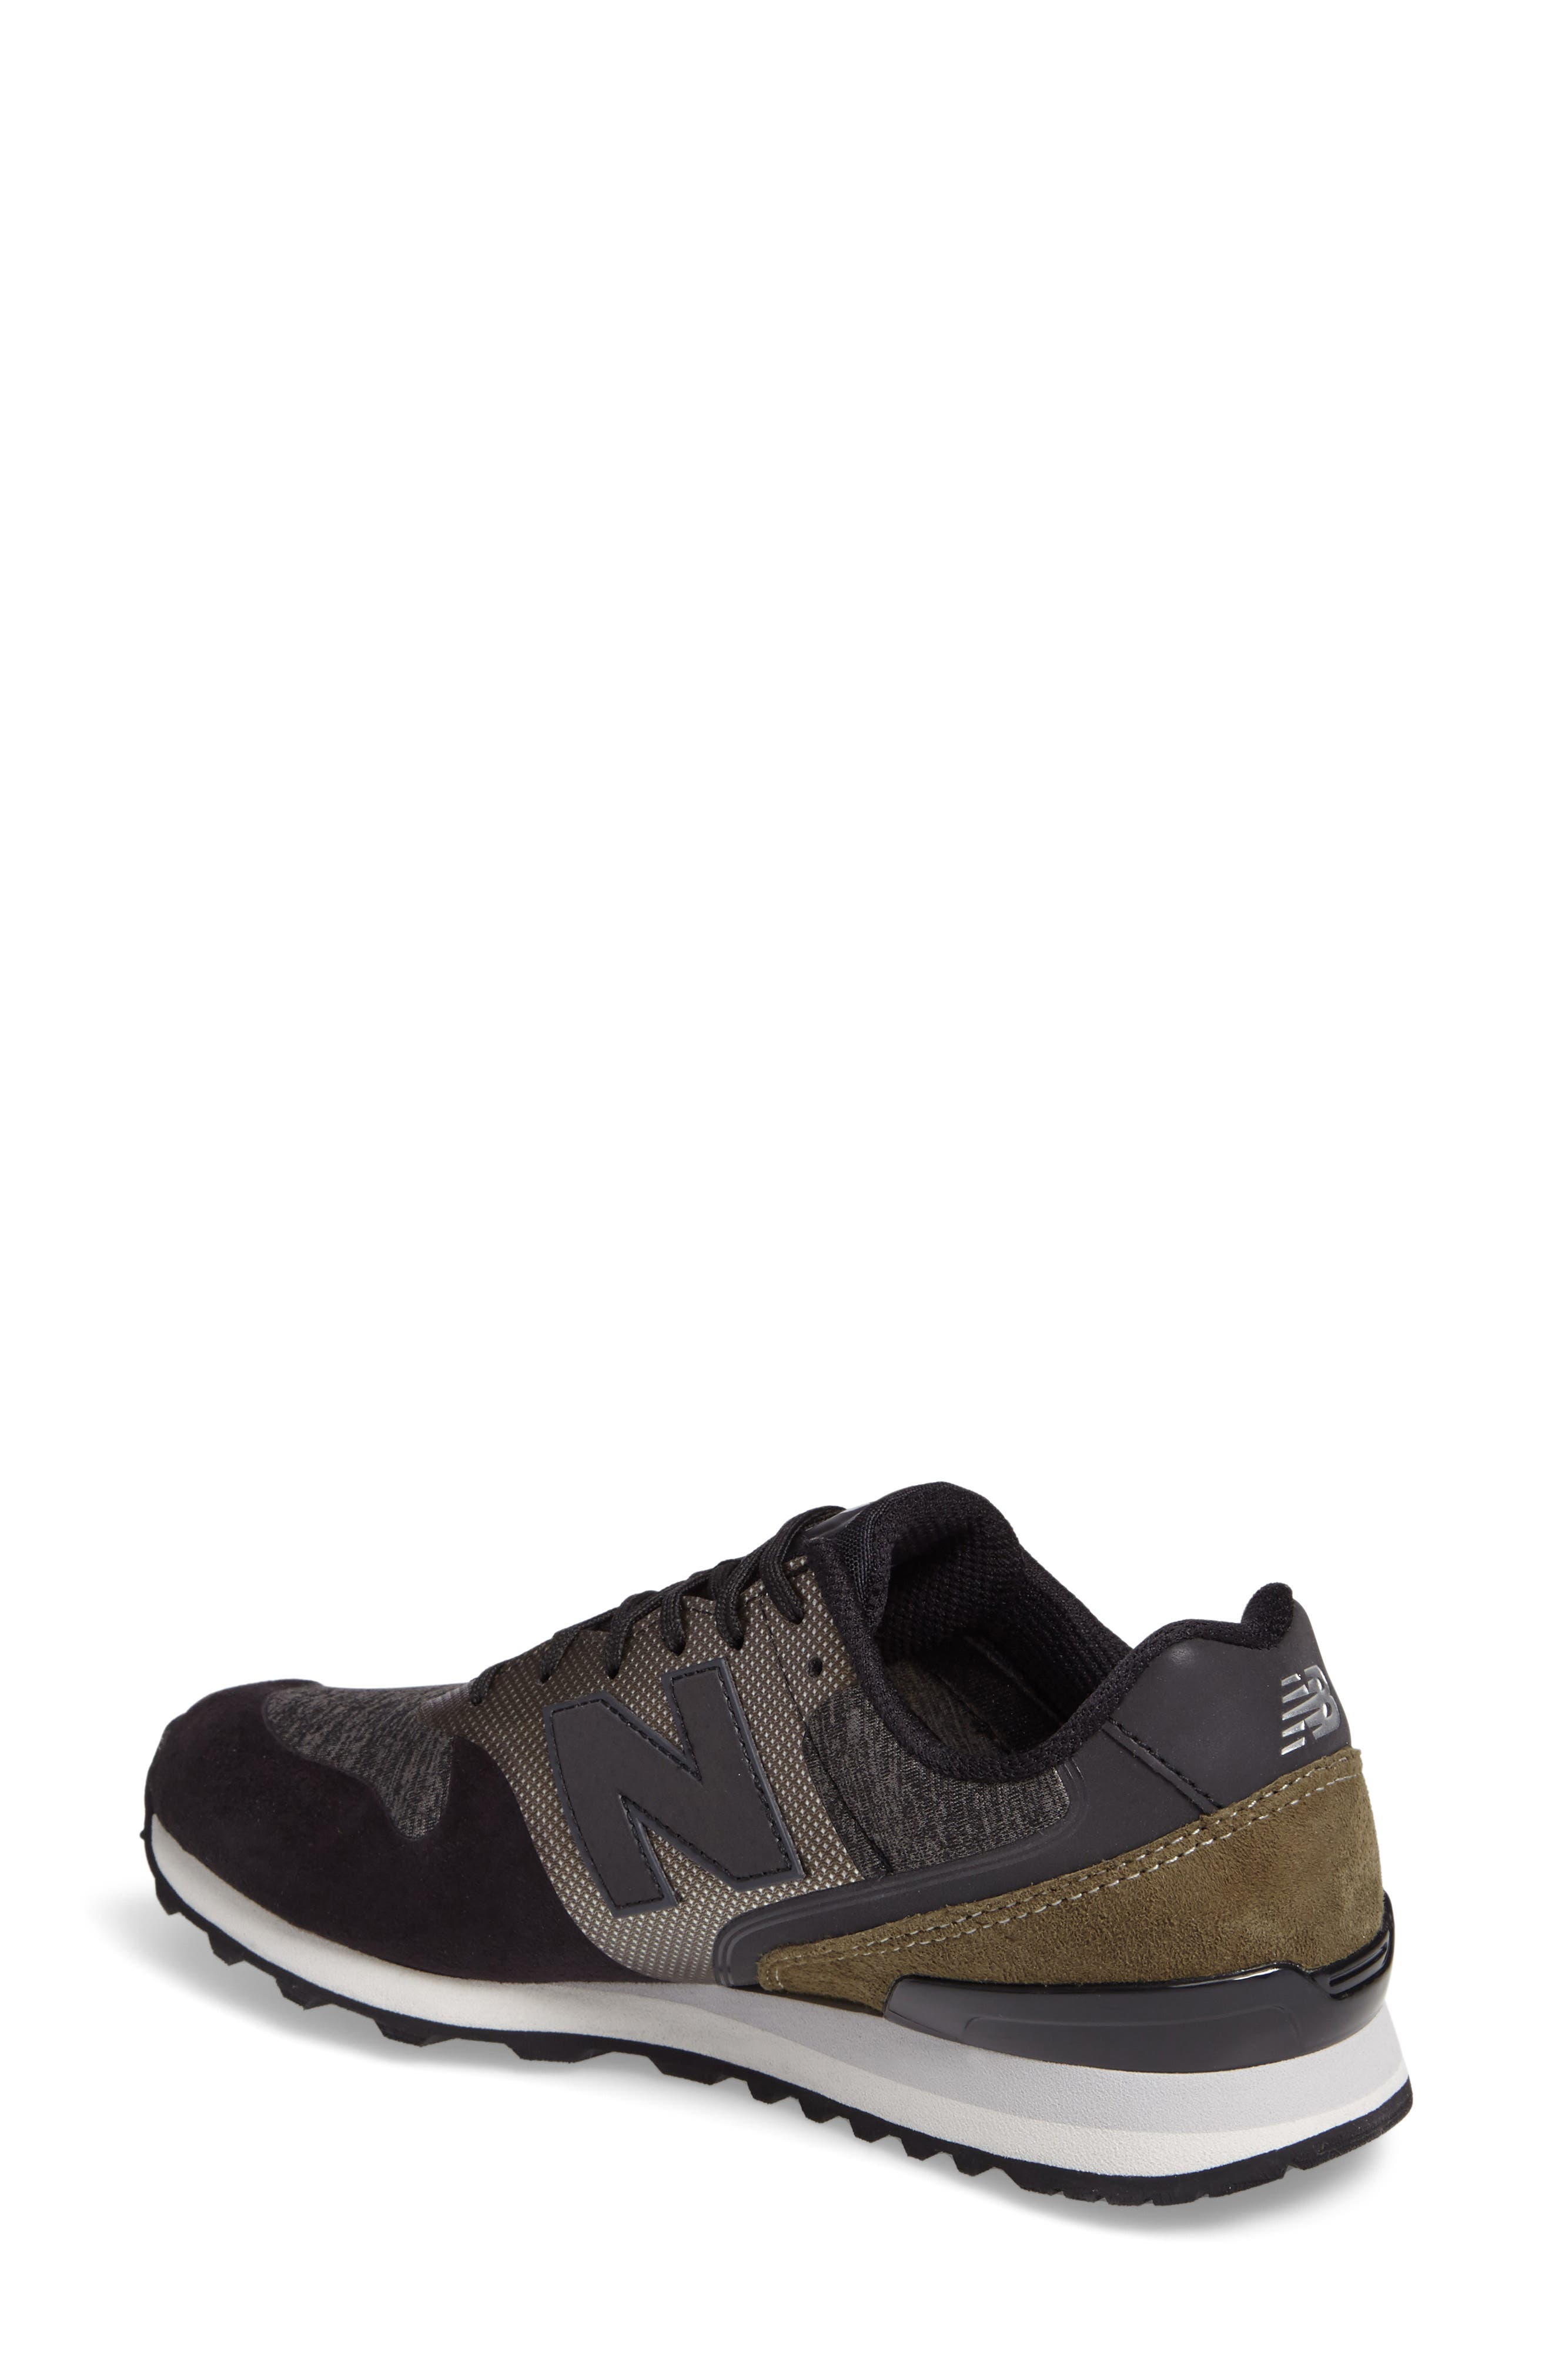 696 Re-Engineered Sneaker,                             Alternate thumbnail 2, color,                             030